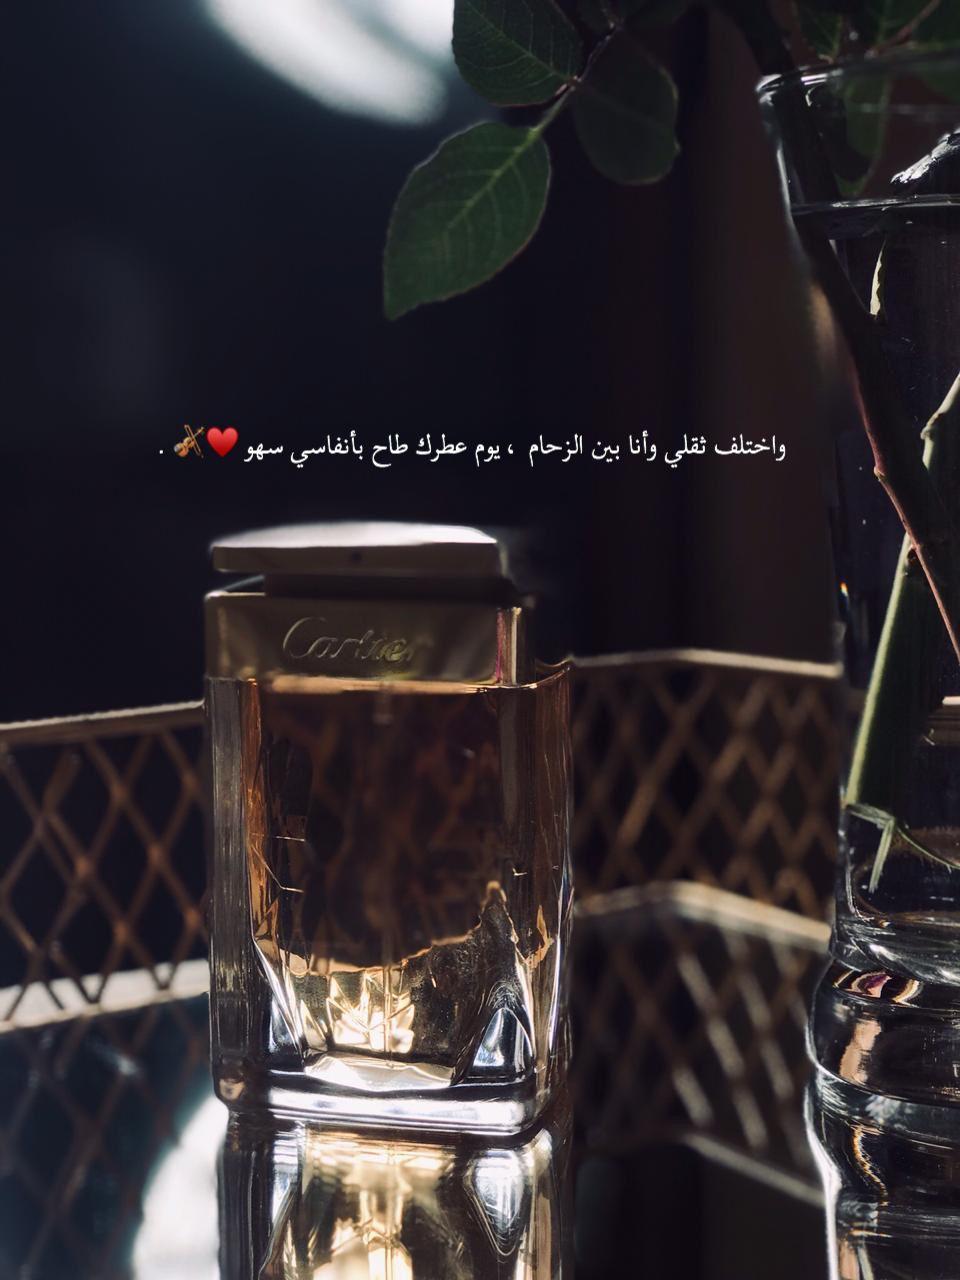 Pin By Elool On Snap Alaa Alabad تصوير يوميات الجامعة اقتباسات عبارات Girly Pictures Phrase Cari